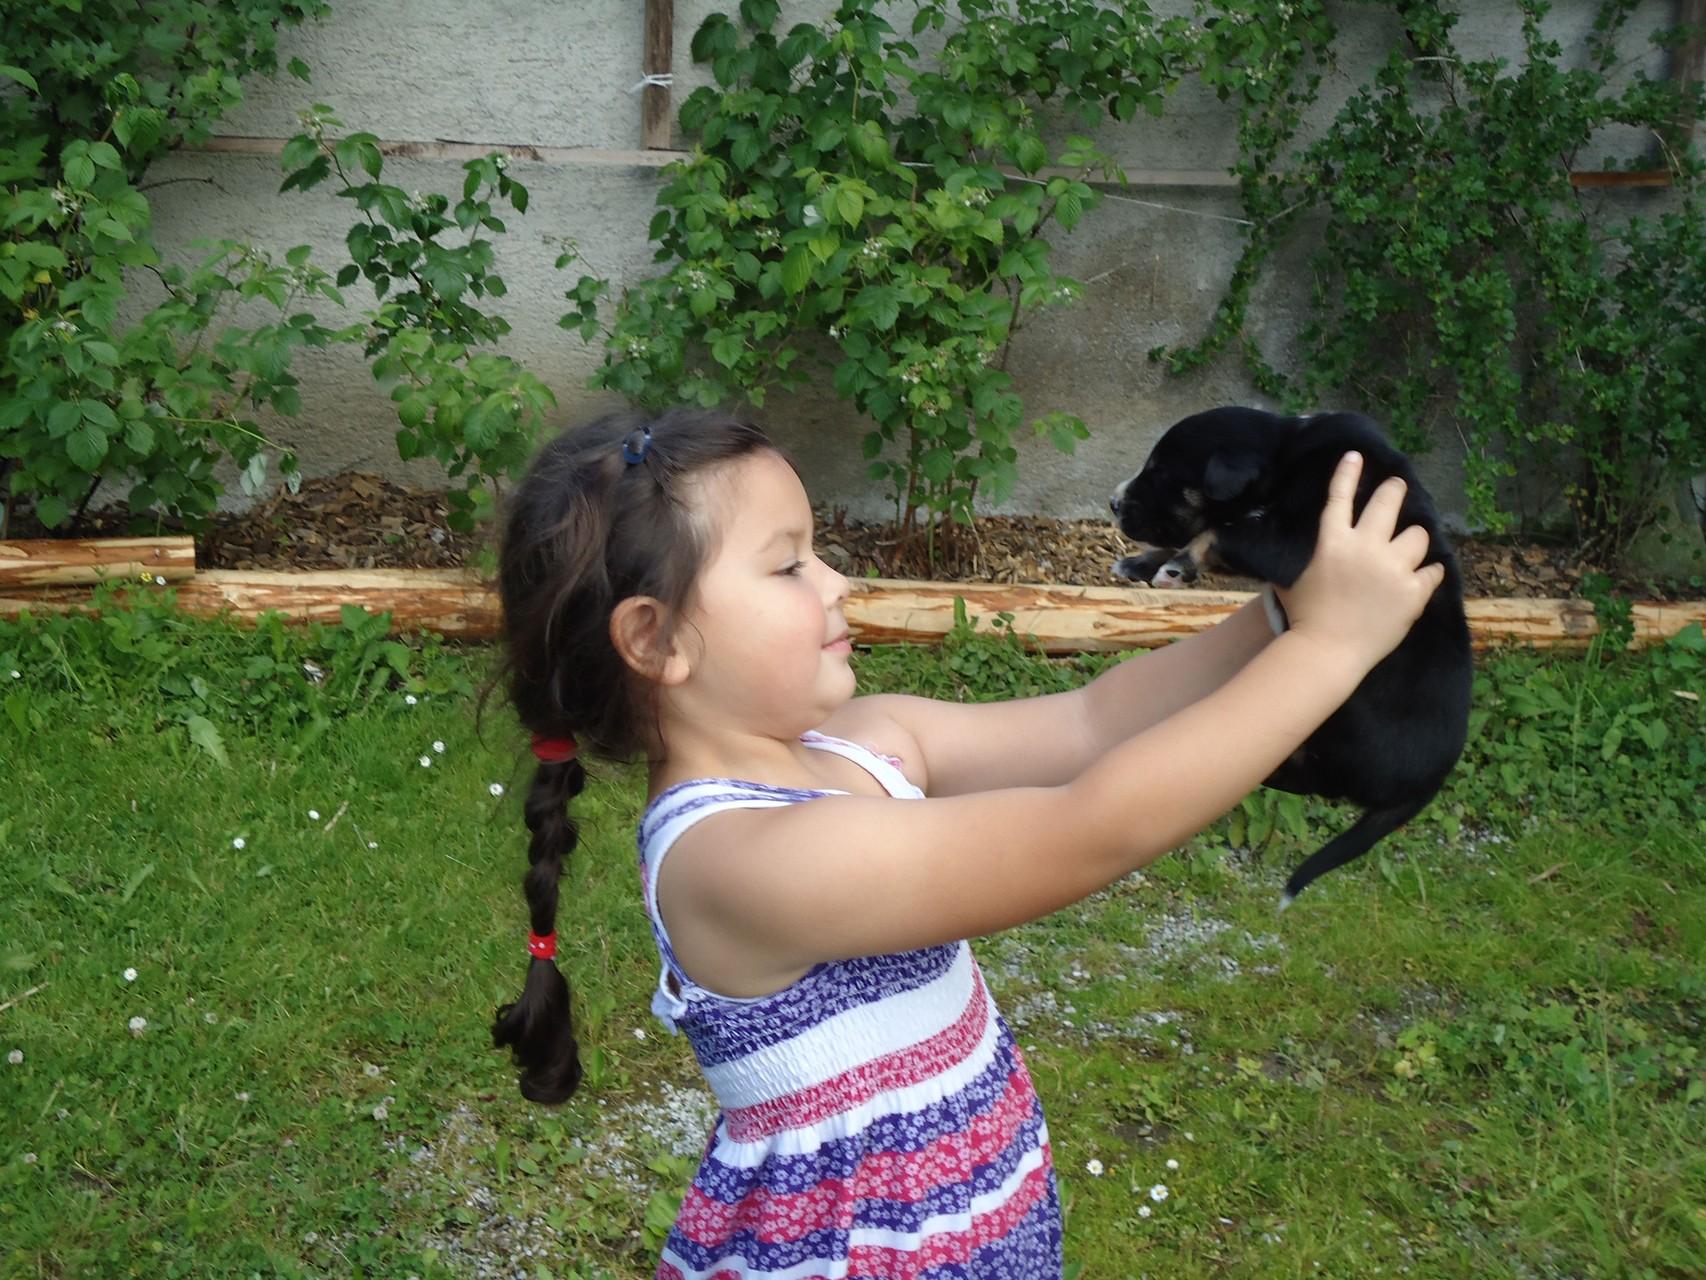 Kind Theresa mit einem unserer kl.Hunde